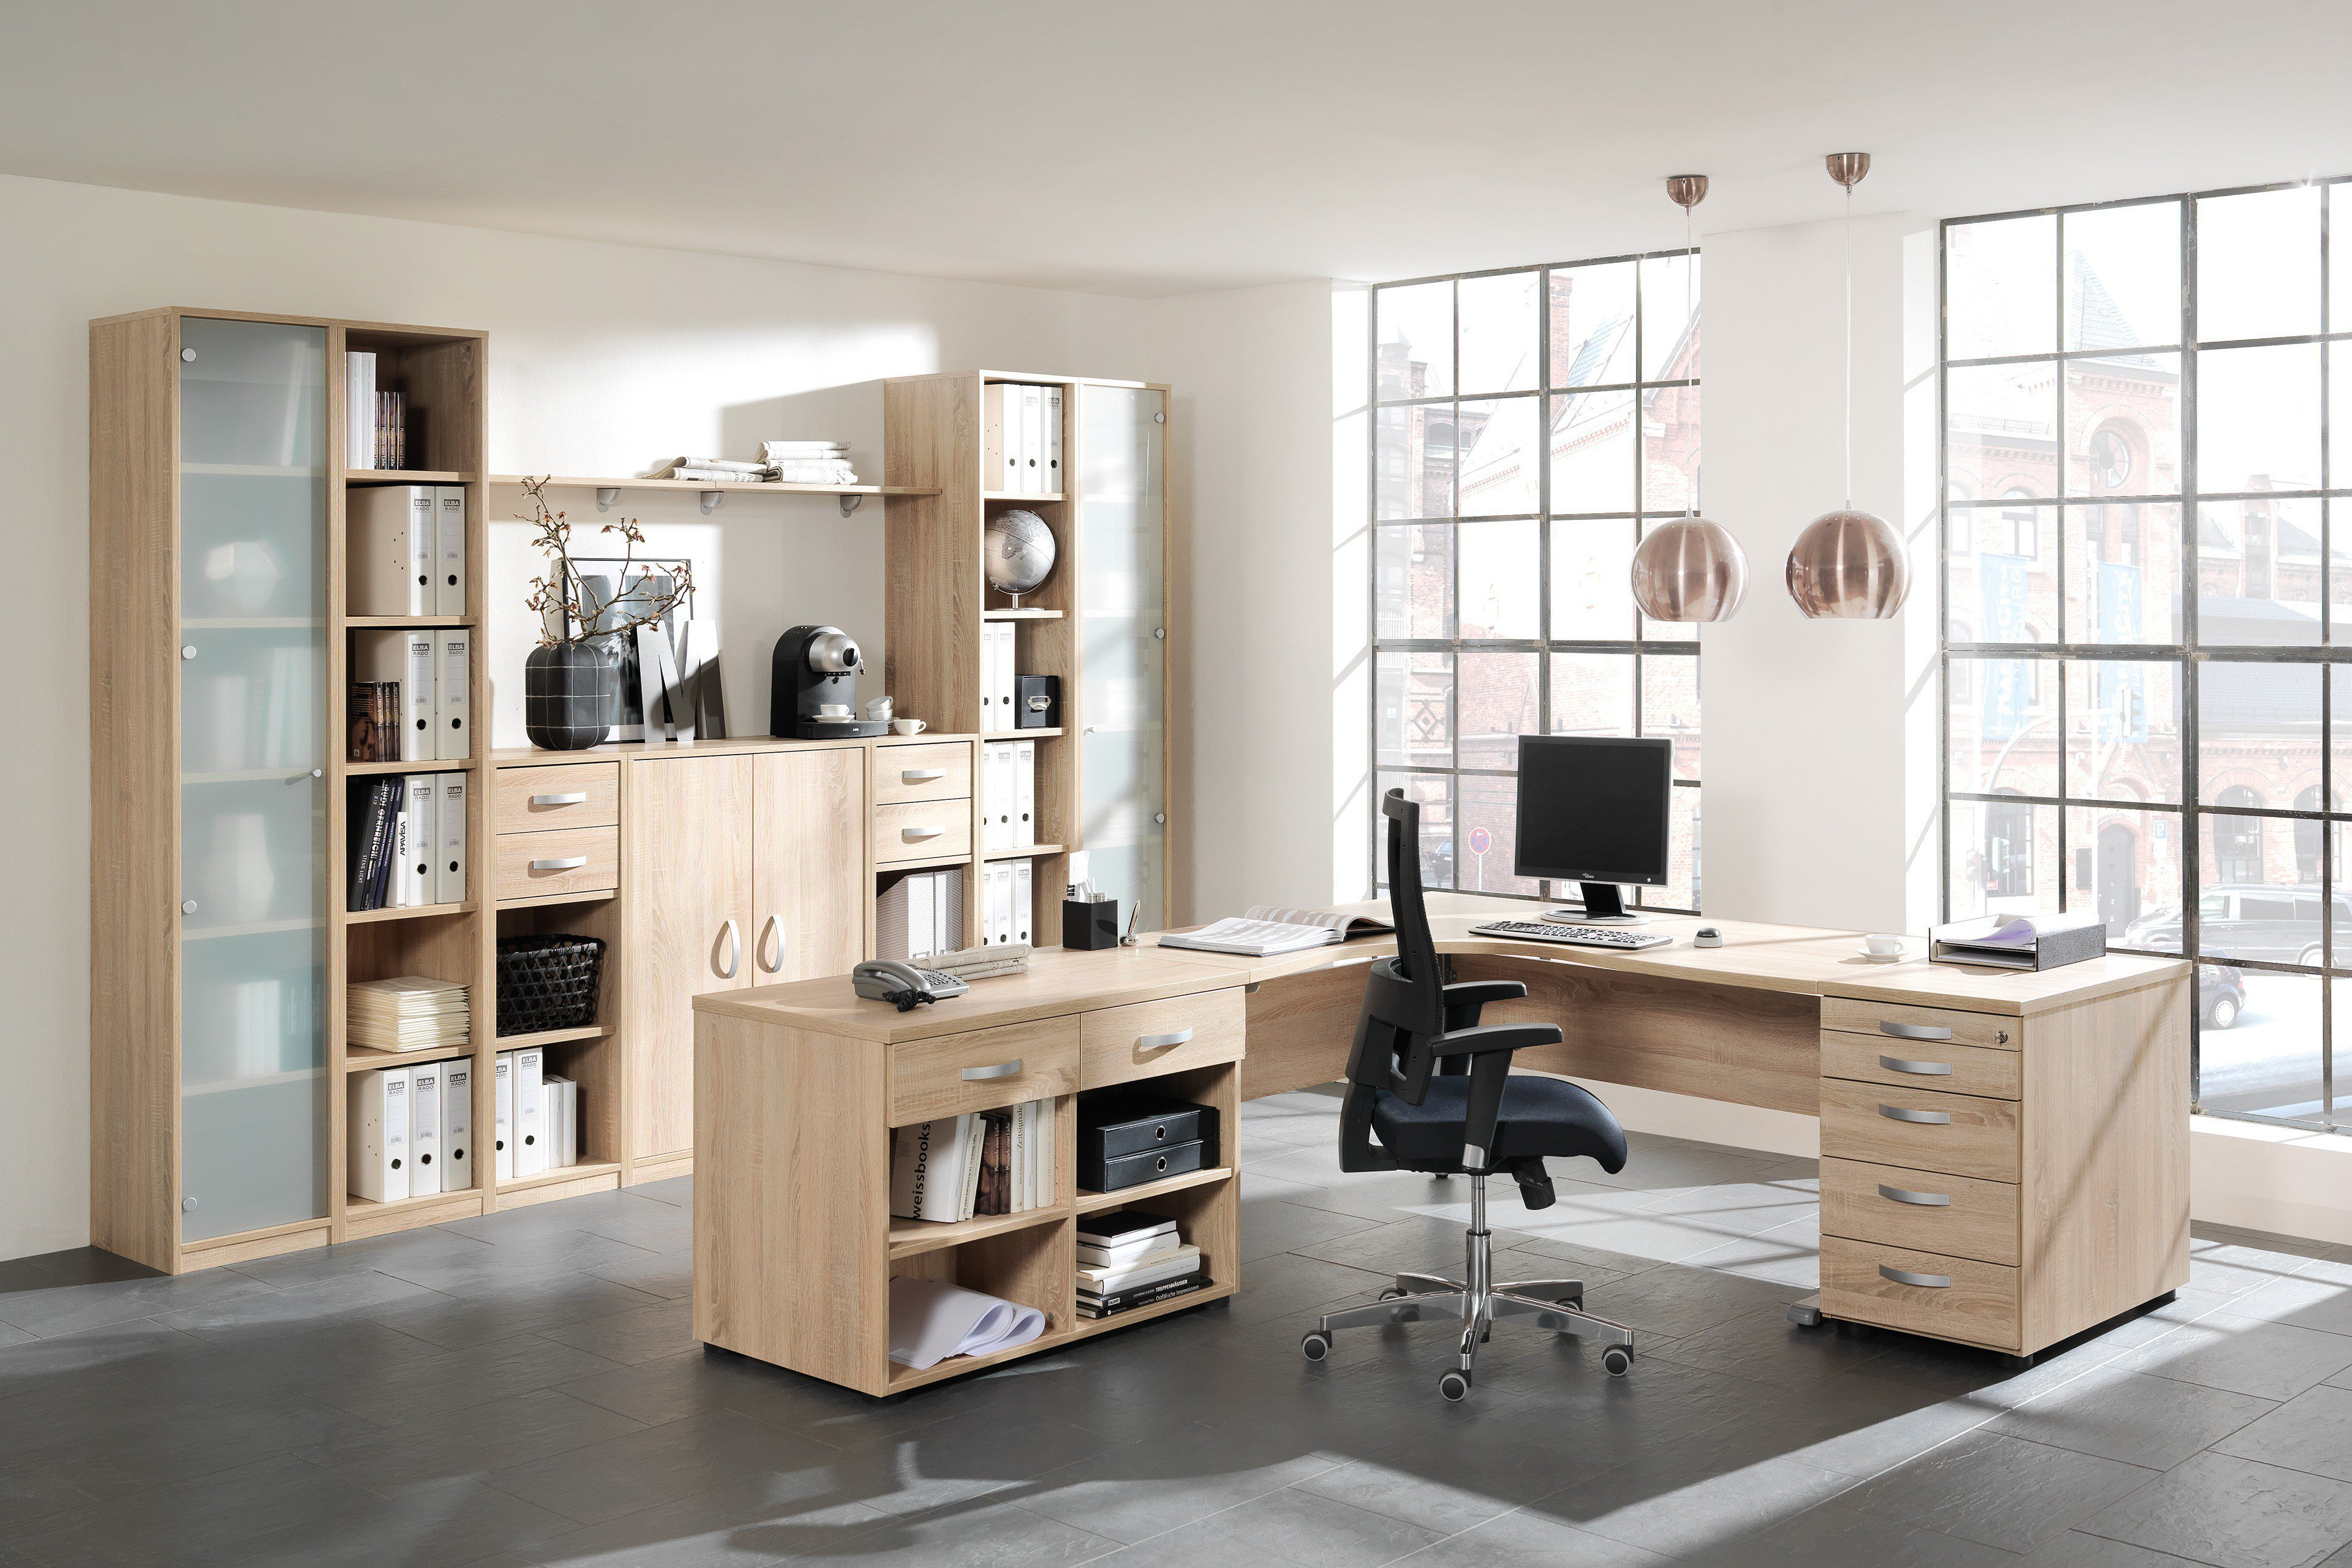 welle b rom bel jobexpress lytswaldorf. Black Bedroom Furniture Sets. Home Design Ideas